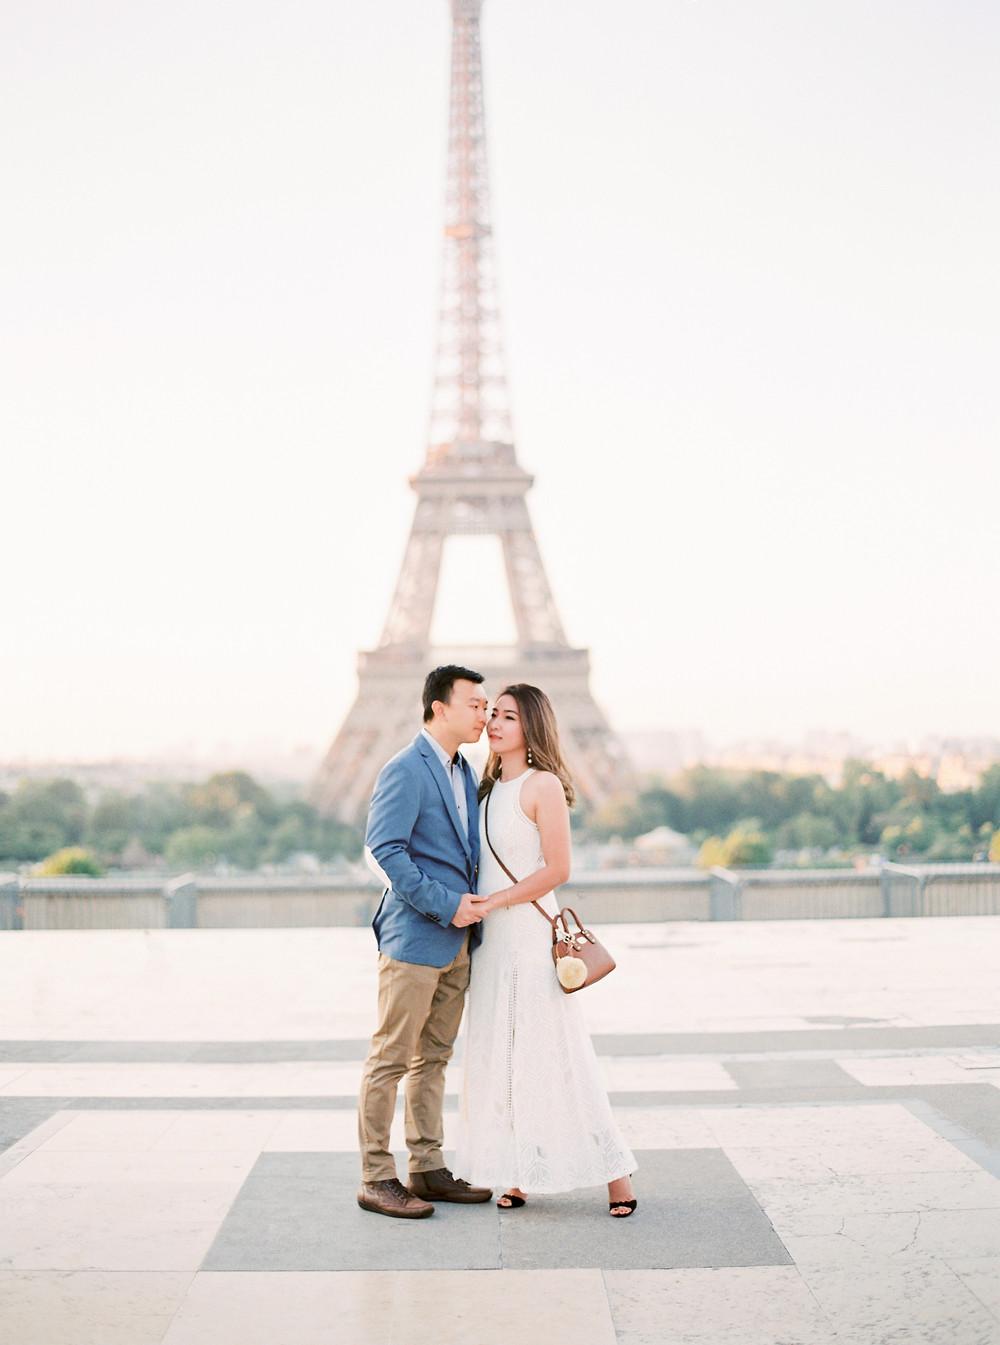 Wedding photoshoot in France